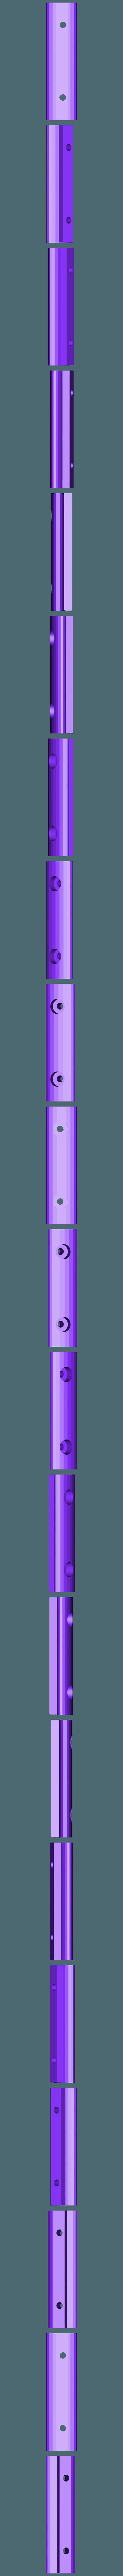 GADGETS slide rail 2print.stl Download free STL file GADGET the robotic Gremlin • 3D printing object, atarka3